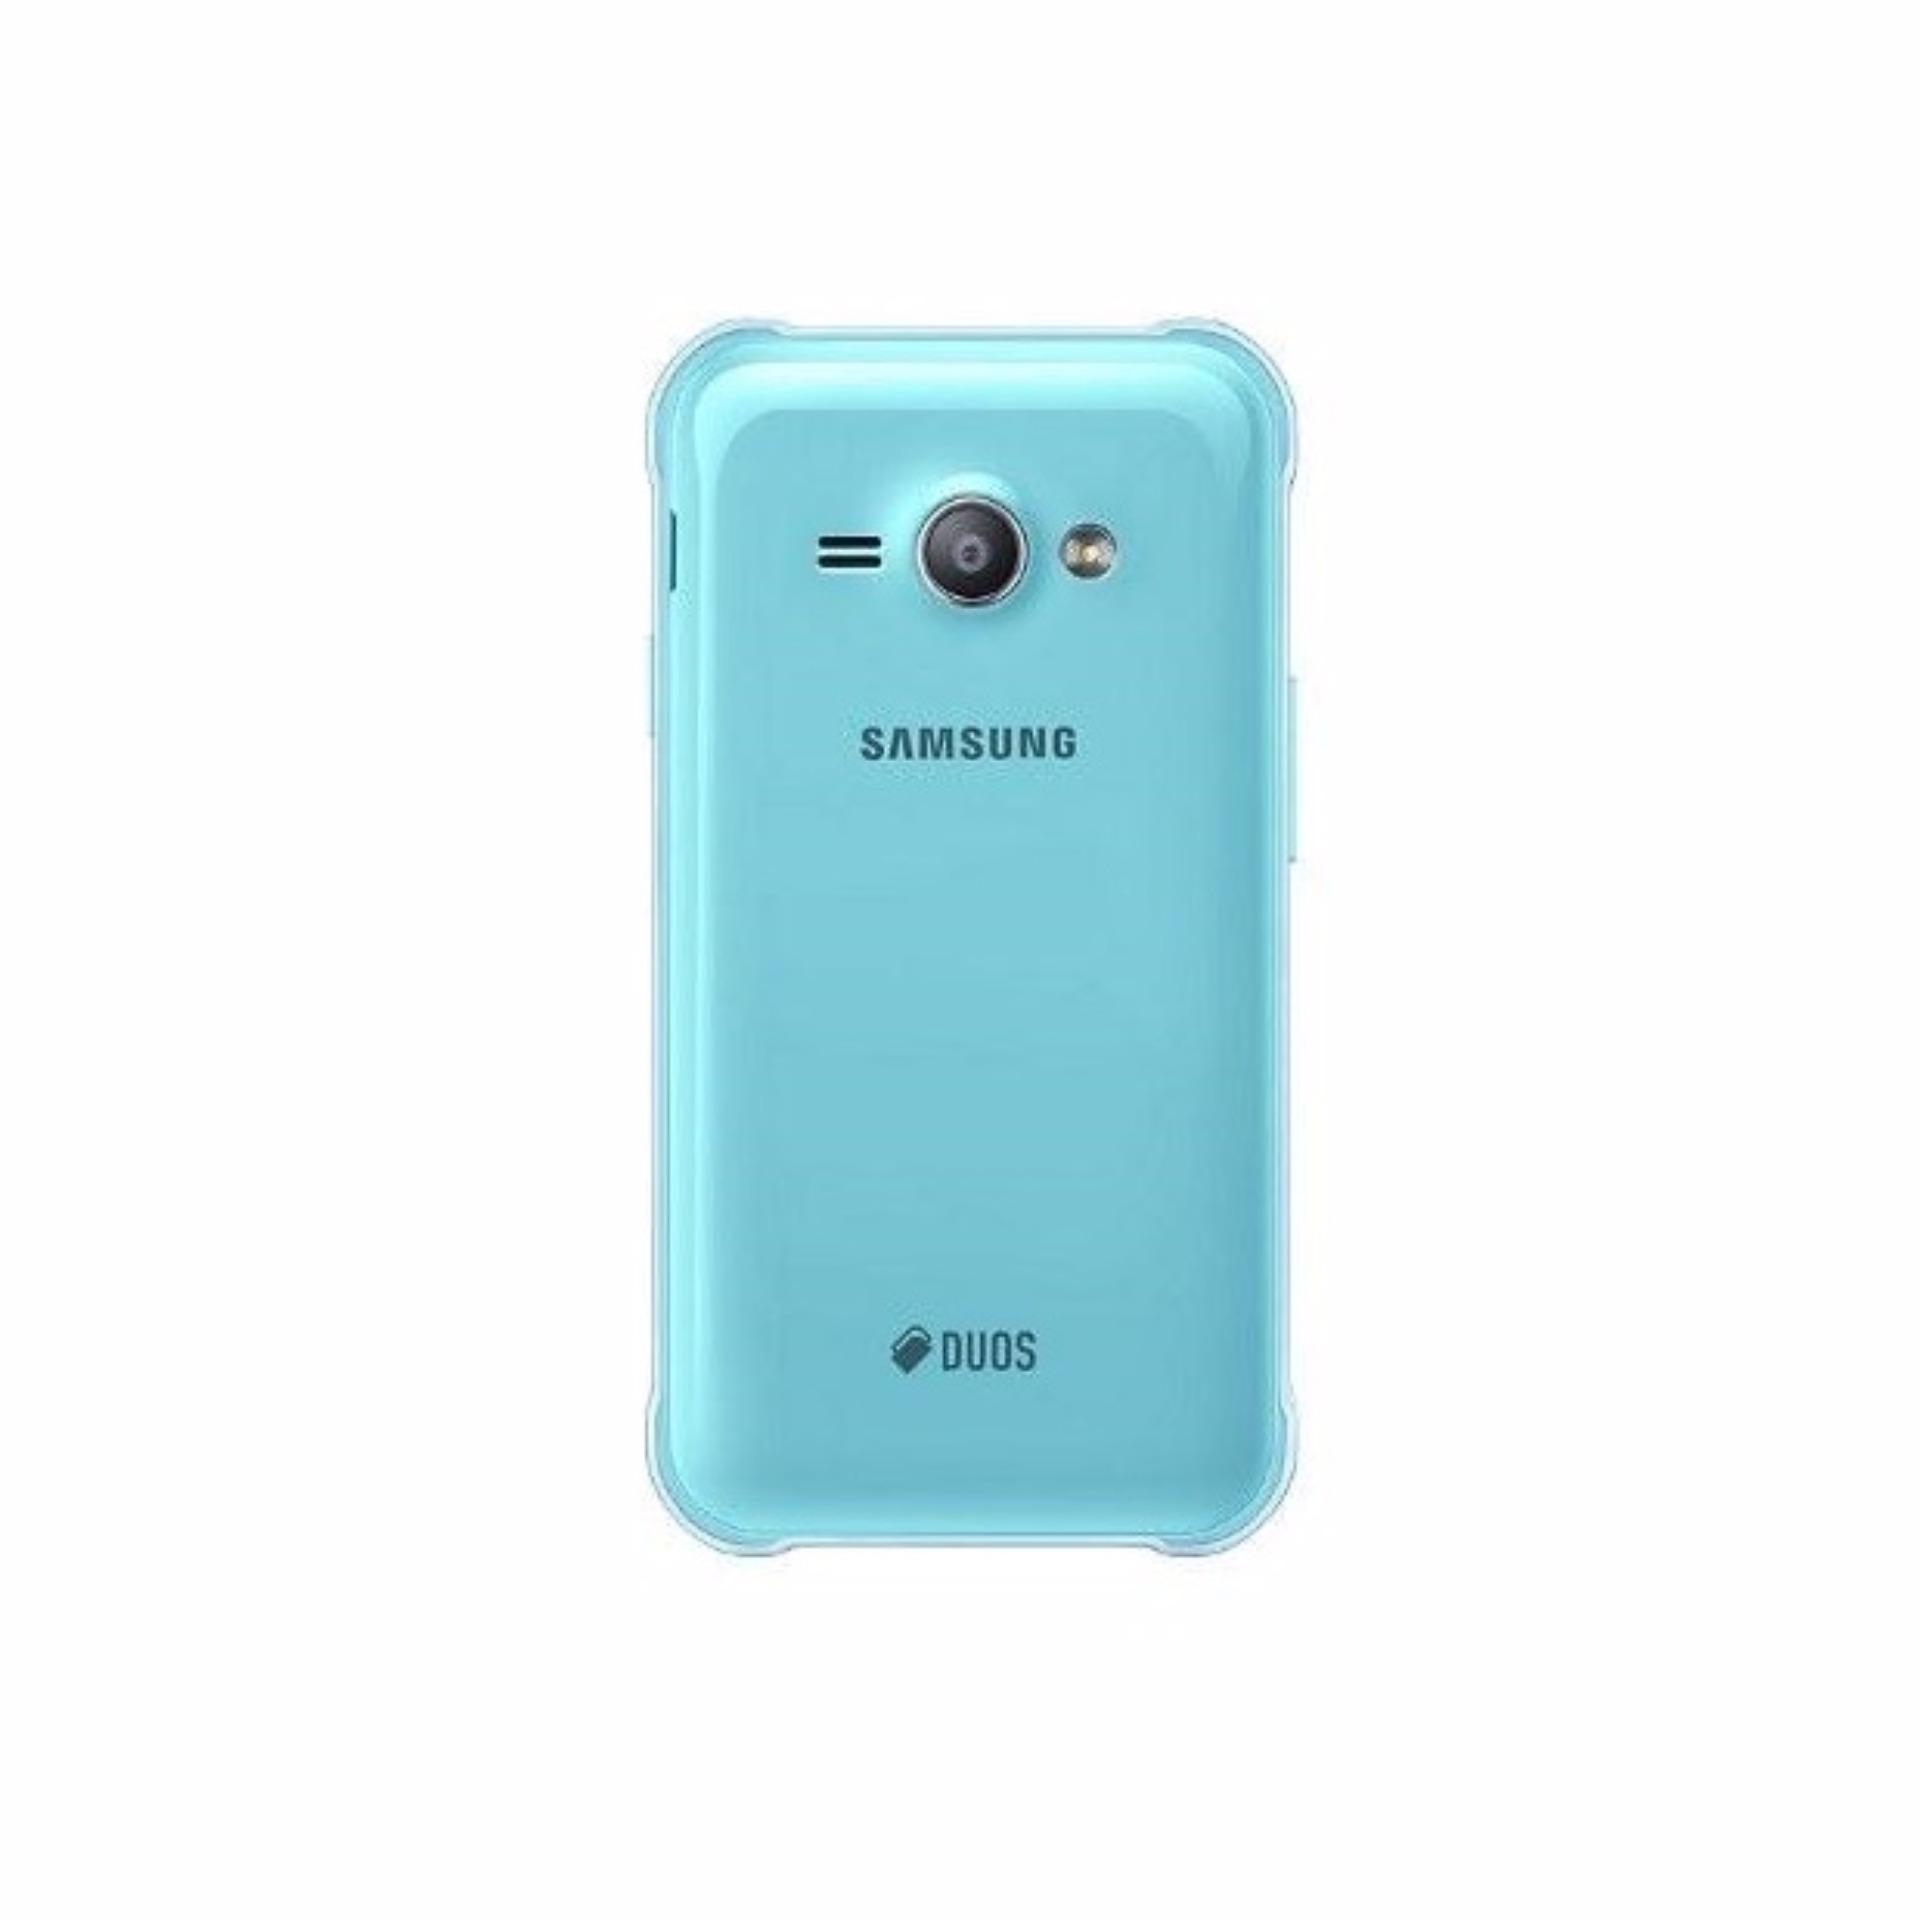 Samsung Galaxy J1 Ace 2016 SM-J111F 8GB - Biru ...